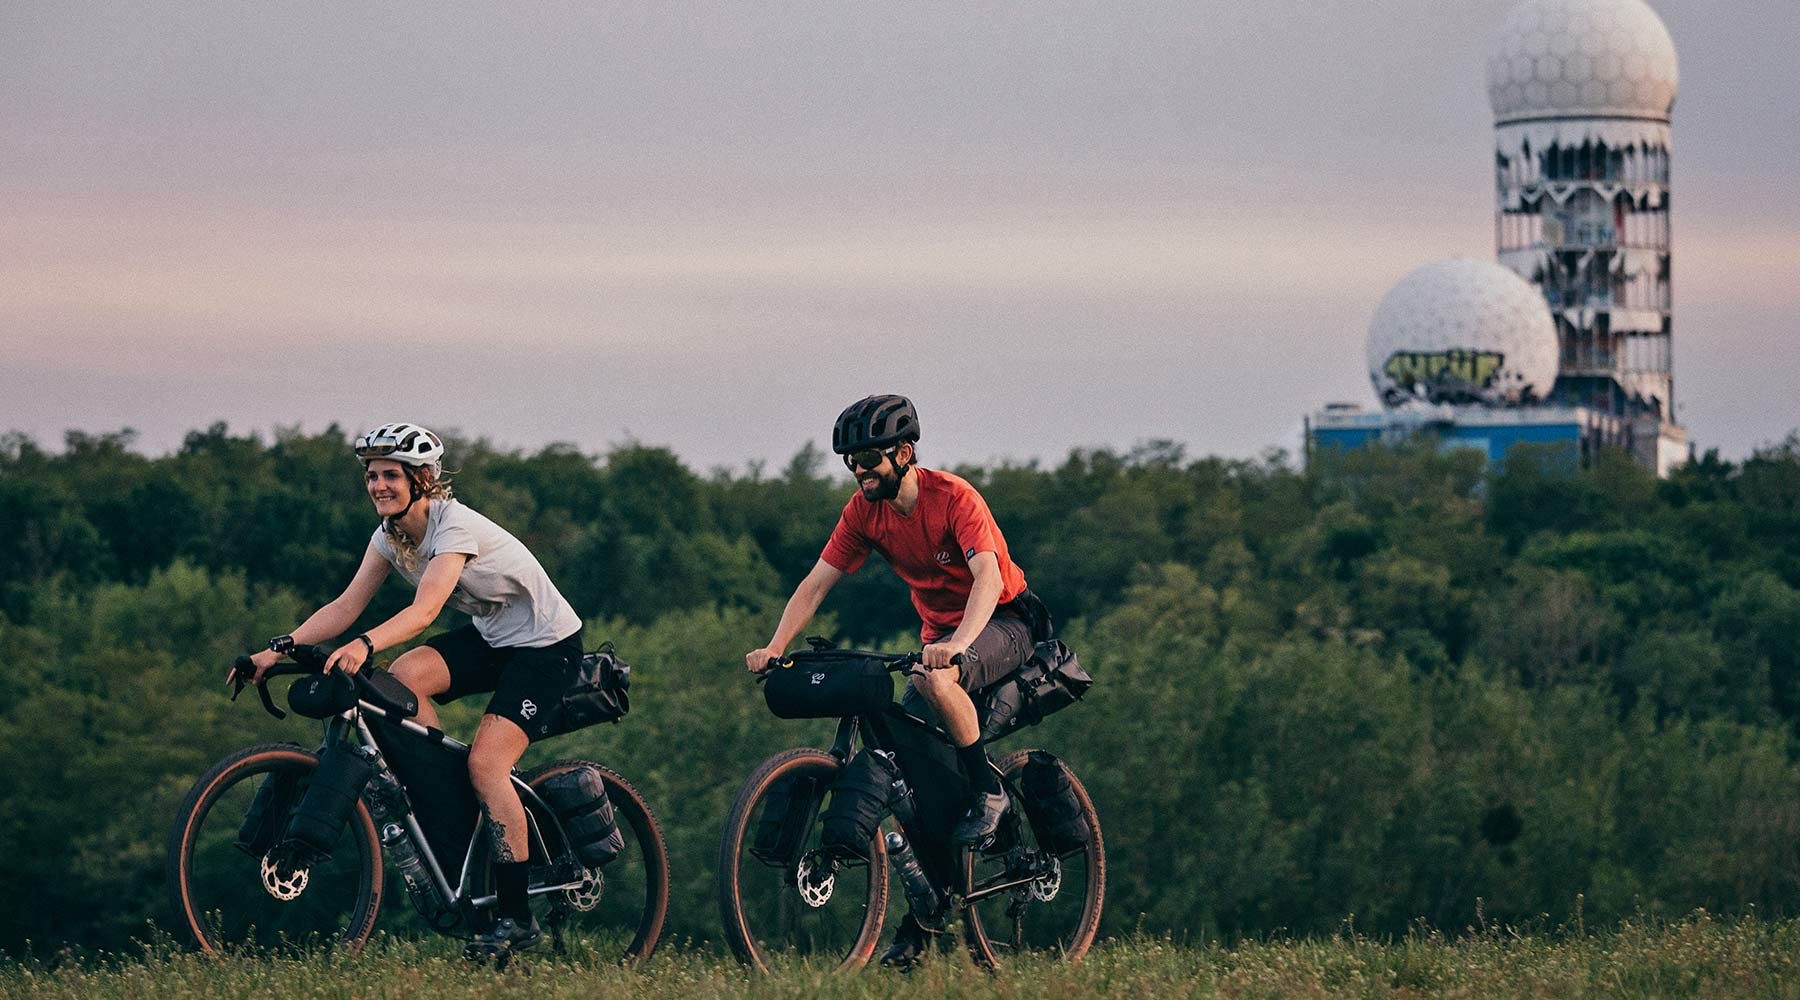 8bar Tflsberg steel off-road adventure bikepacking mountain bike, photo by Stefan Haehnel,Berlin riding